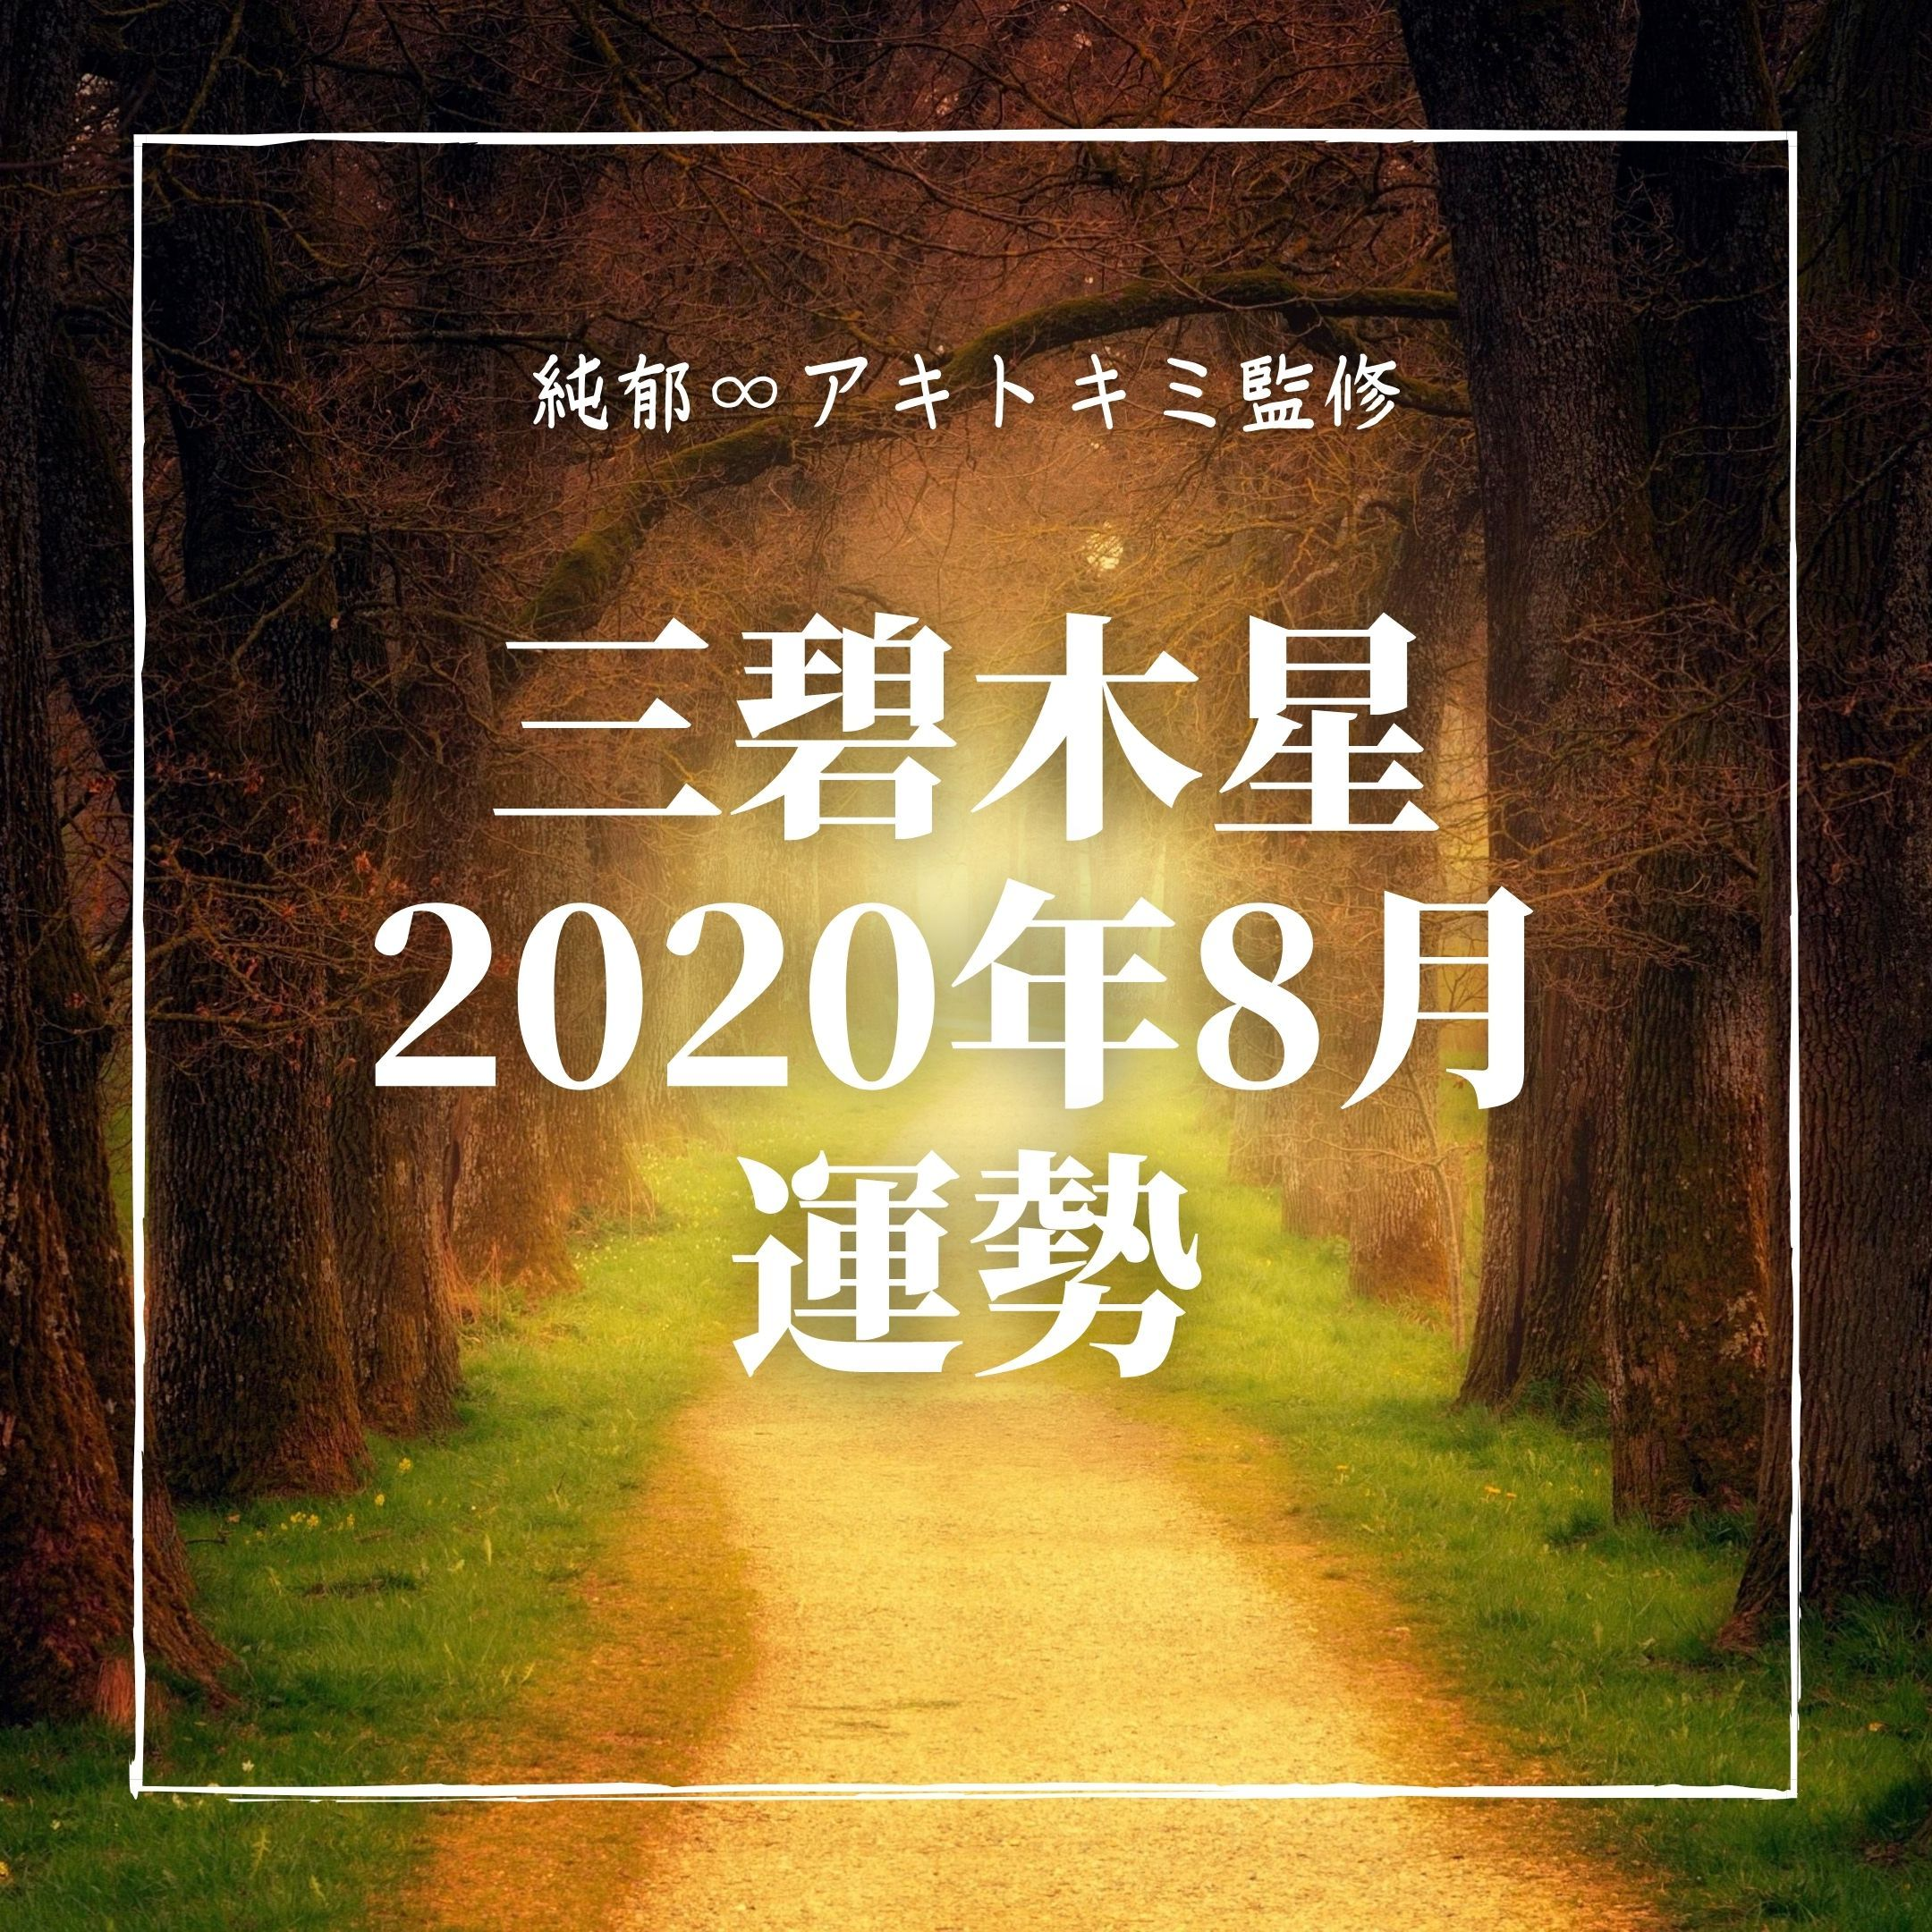 木星 2020 年 四緑